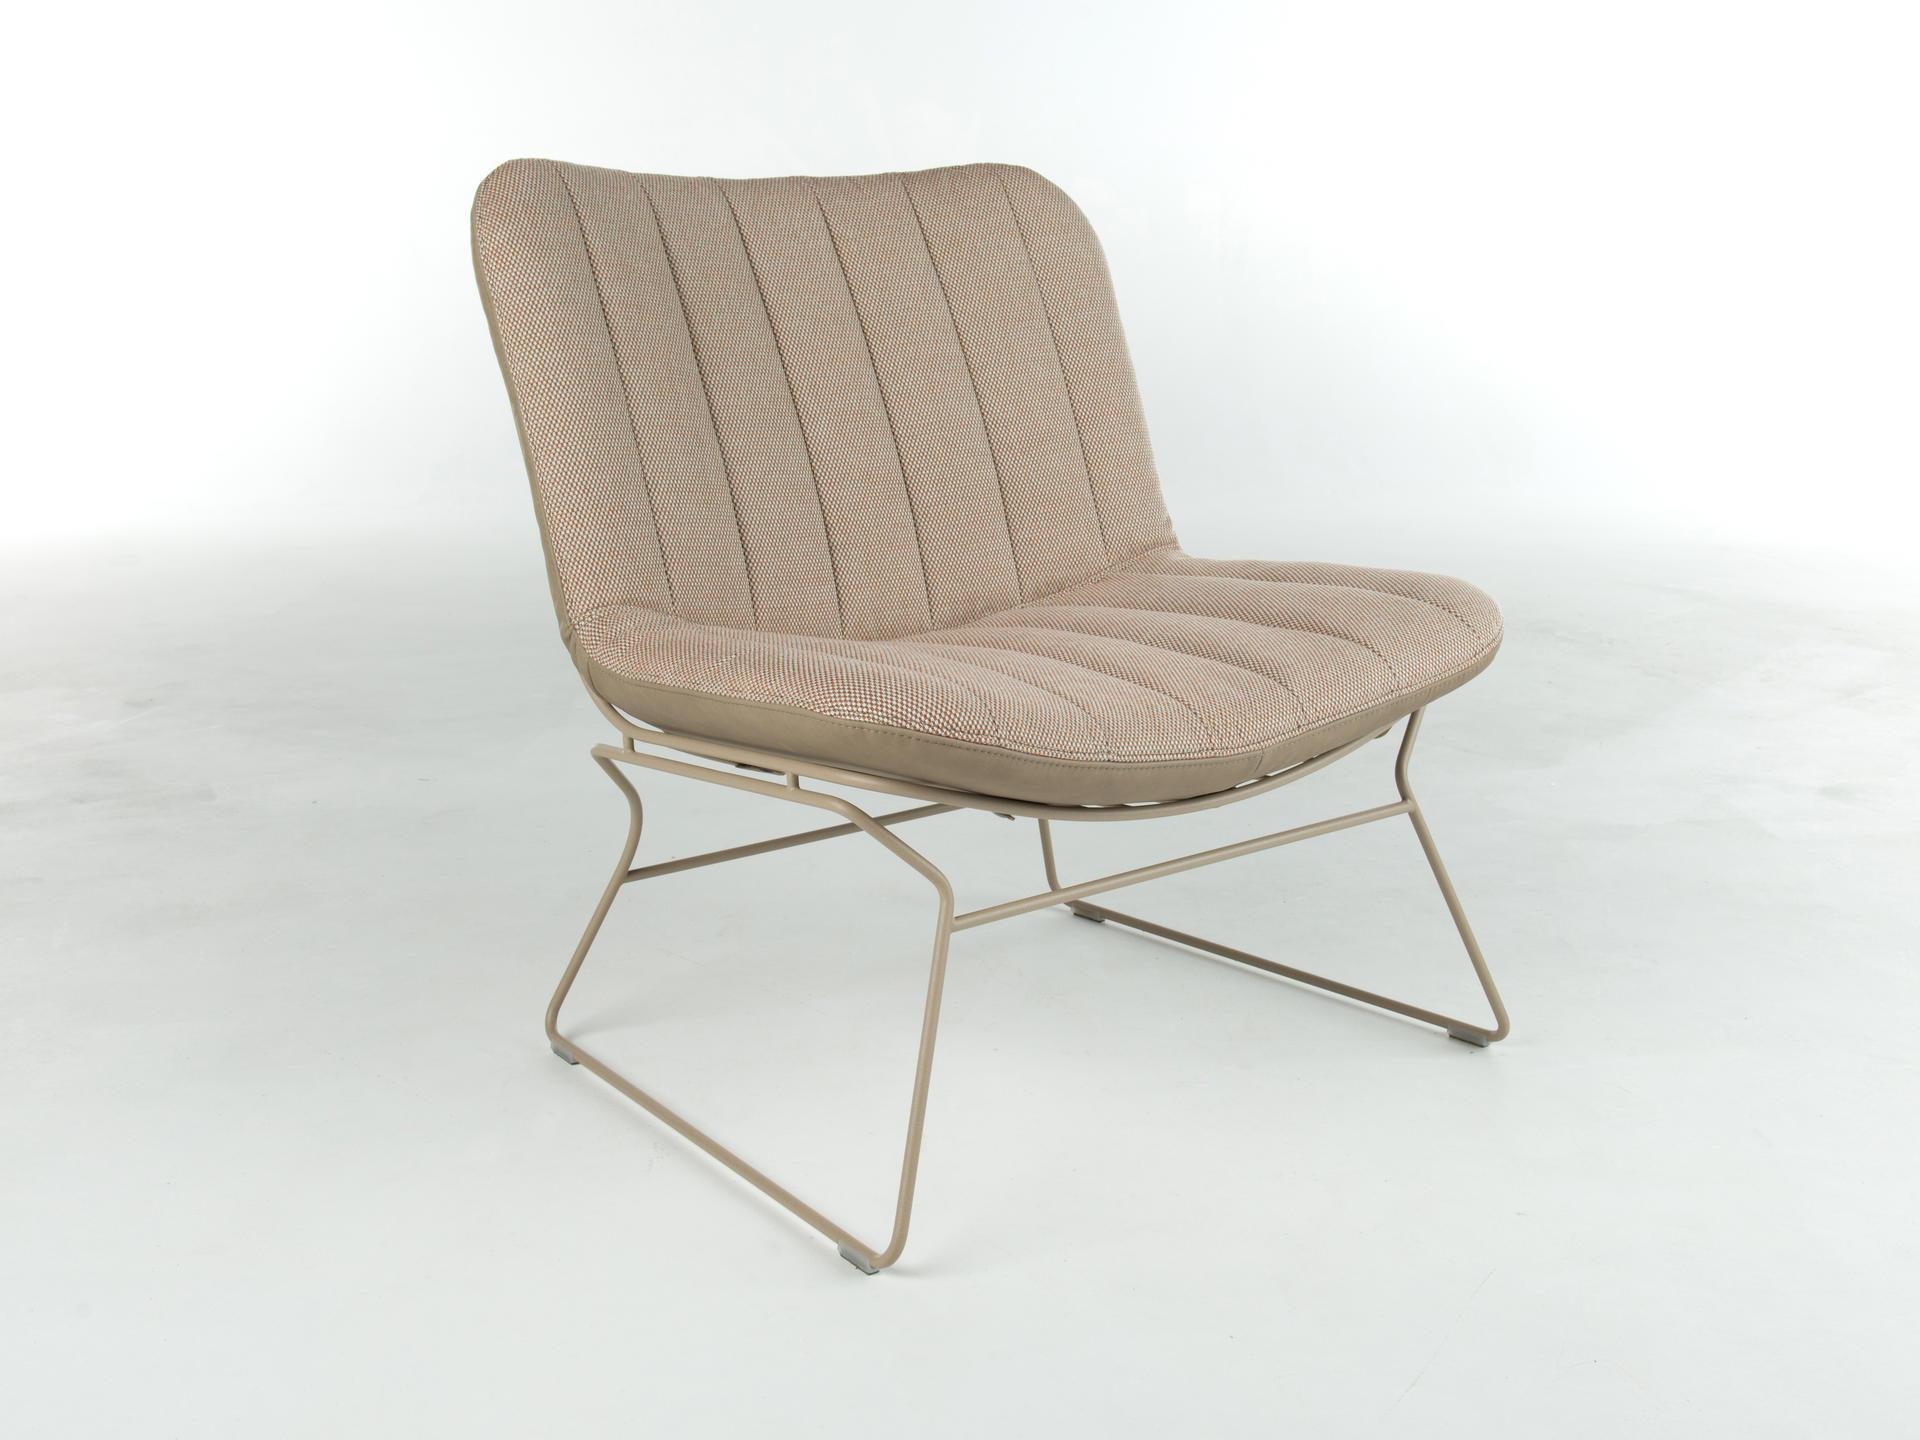 Кресло Draat, Bert Plantagie